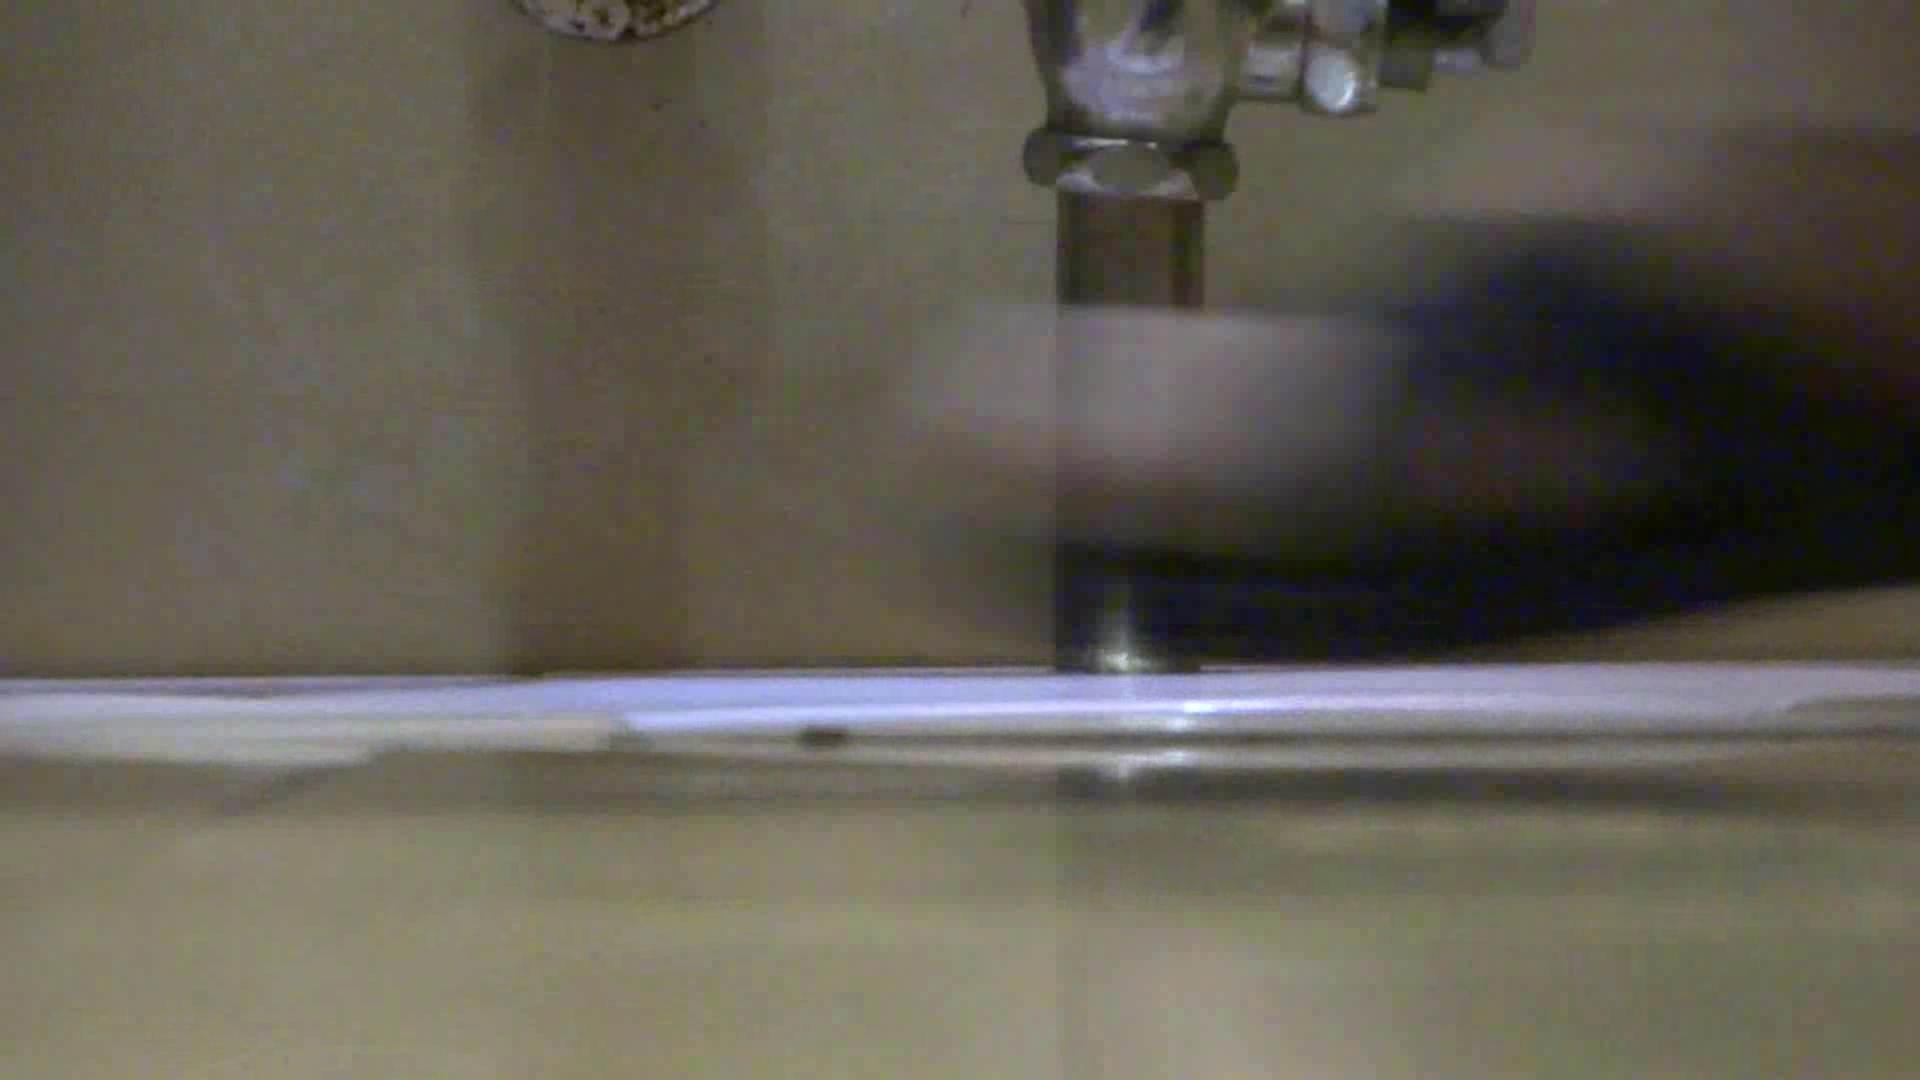 隣国化粧室下から御免!! No.15 洗面所 | 美女H映像  103画像 88